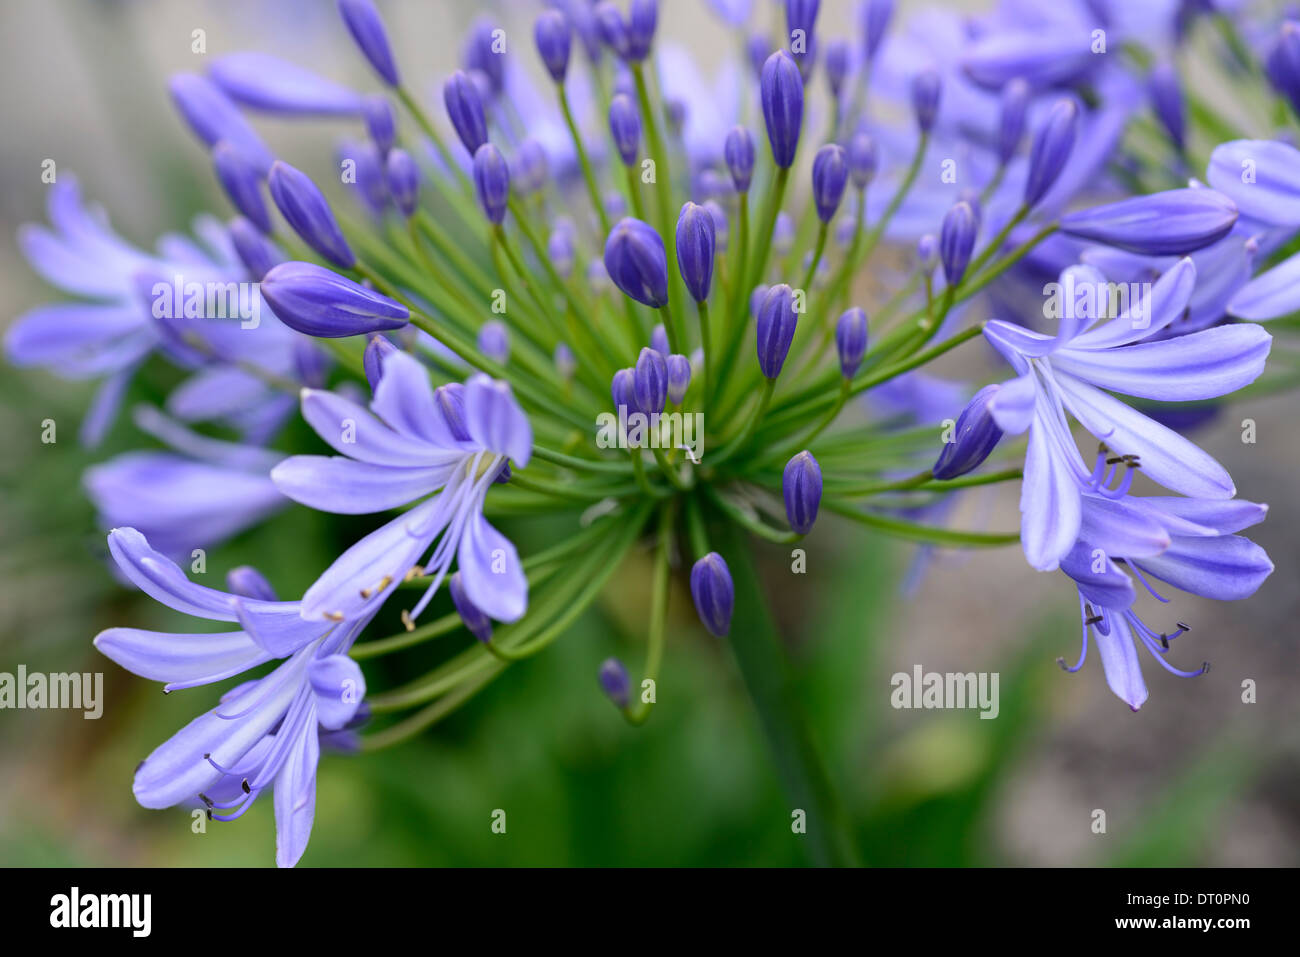 agapanthus giganteus ardernei blue lilac flower flowerhead flowers flowering blossoming cluster wildlife friendly stripes - Stock Image